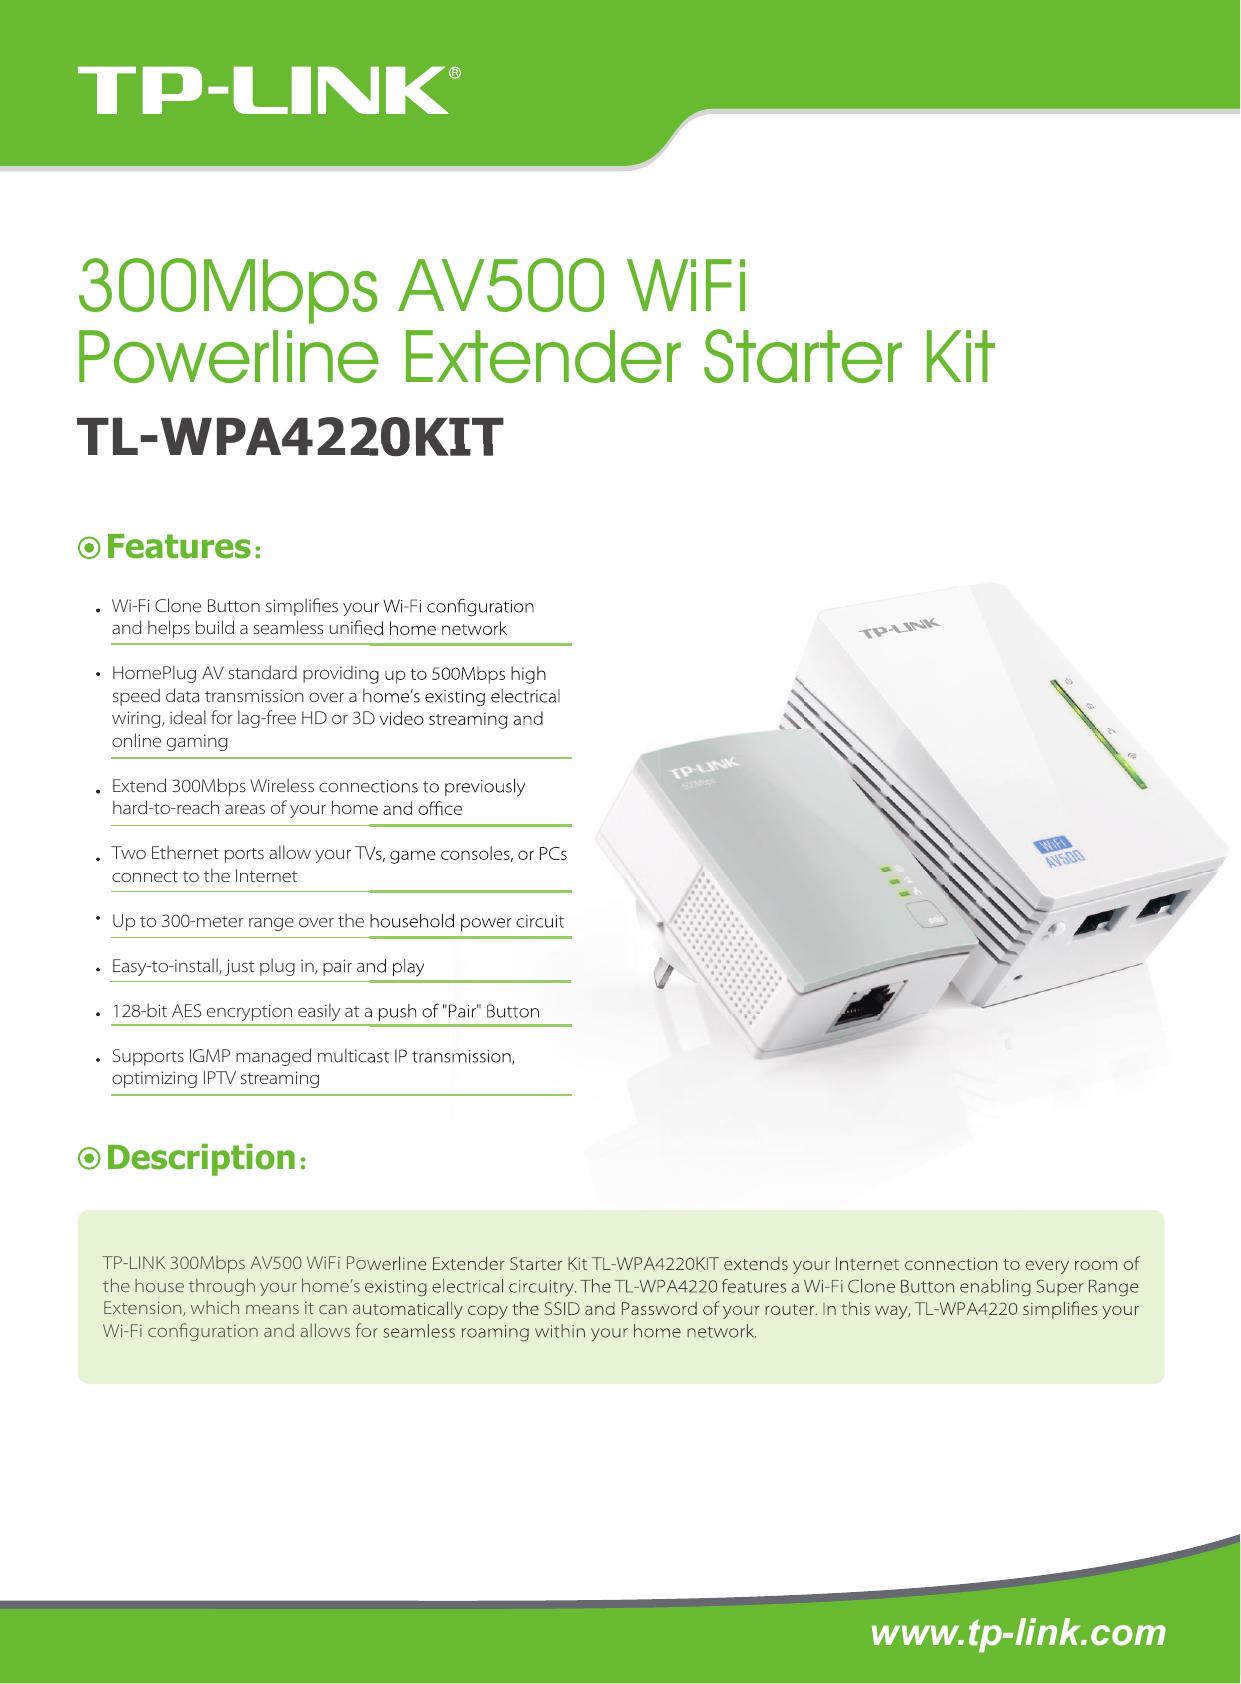 Page 1 of 2 - TL-WPA4220KIT(AU) 1.0  TL-WPA4220KIT(AU V1 Datasheet